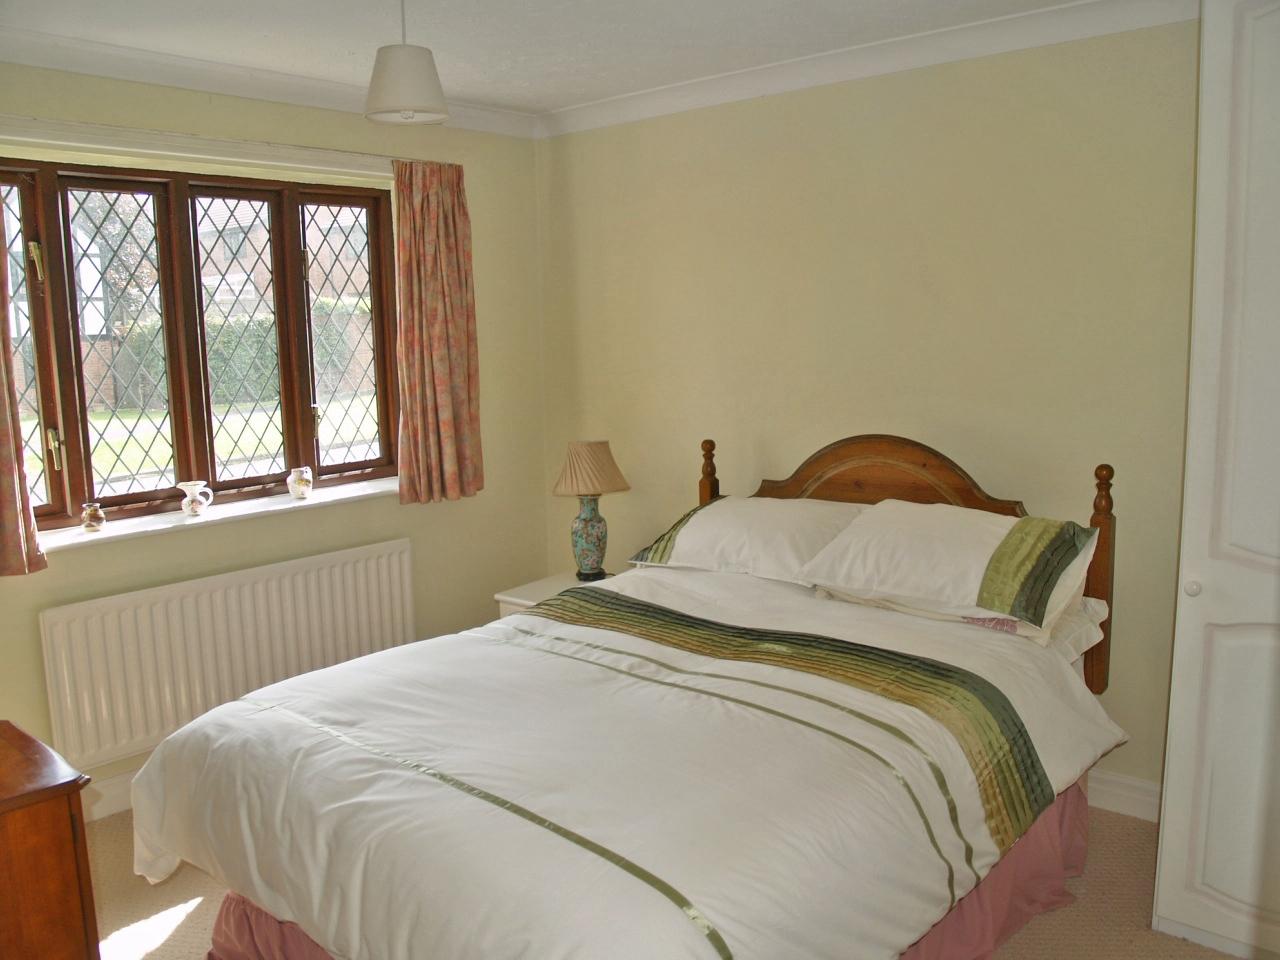 4 bedroom detached house SSTC in Birmingham - photograph 14.